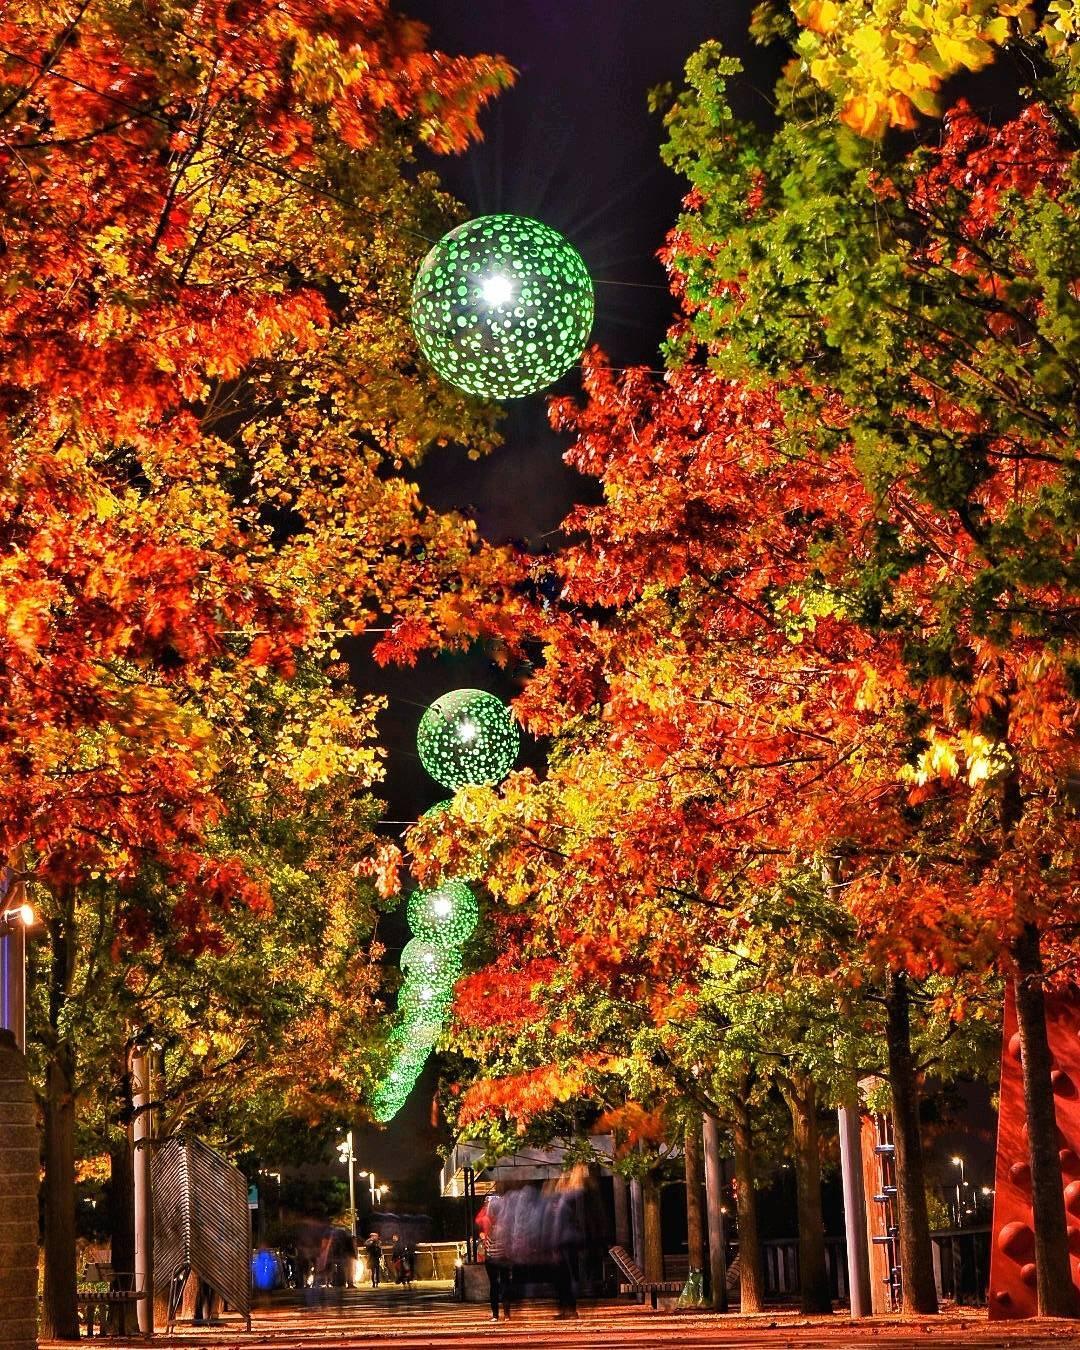 Stratford London in the autumn david248c